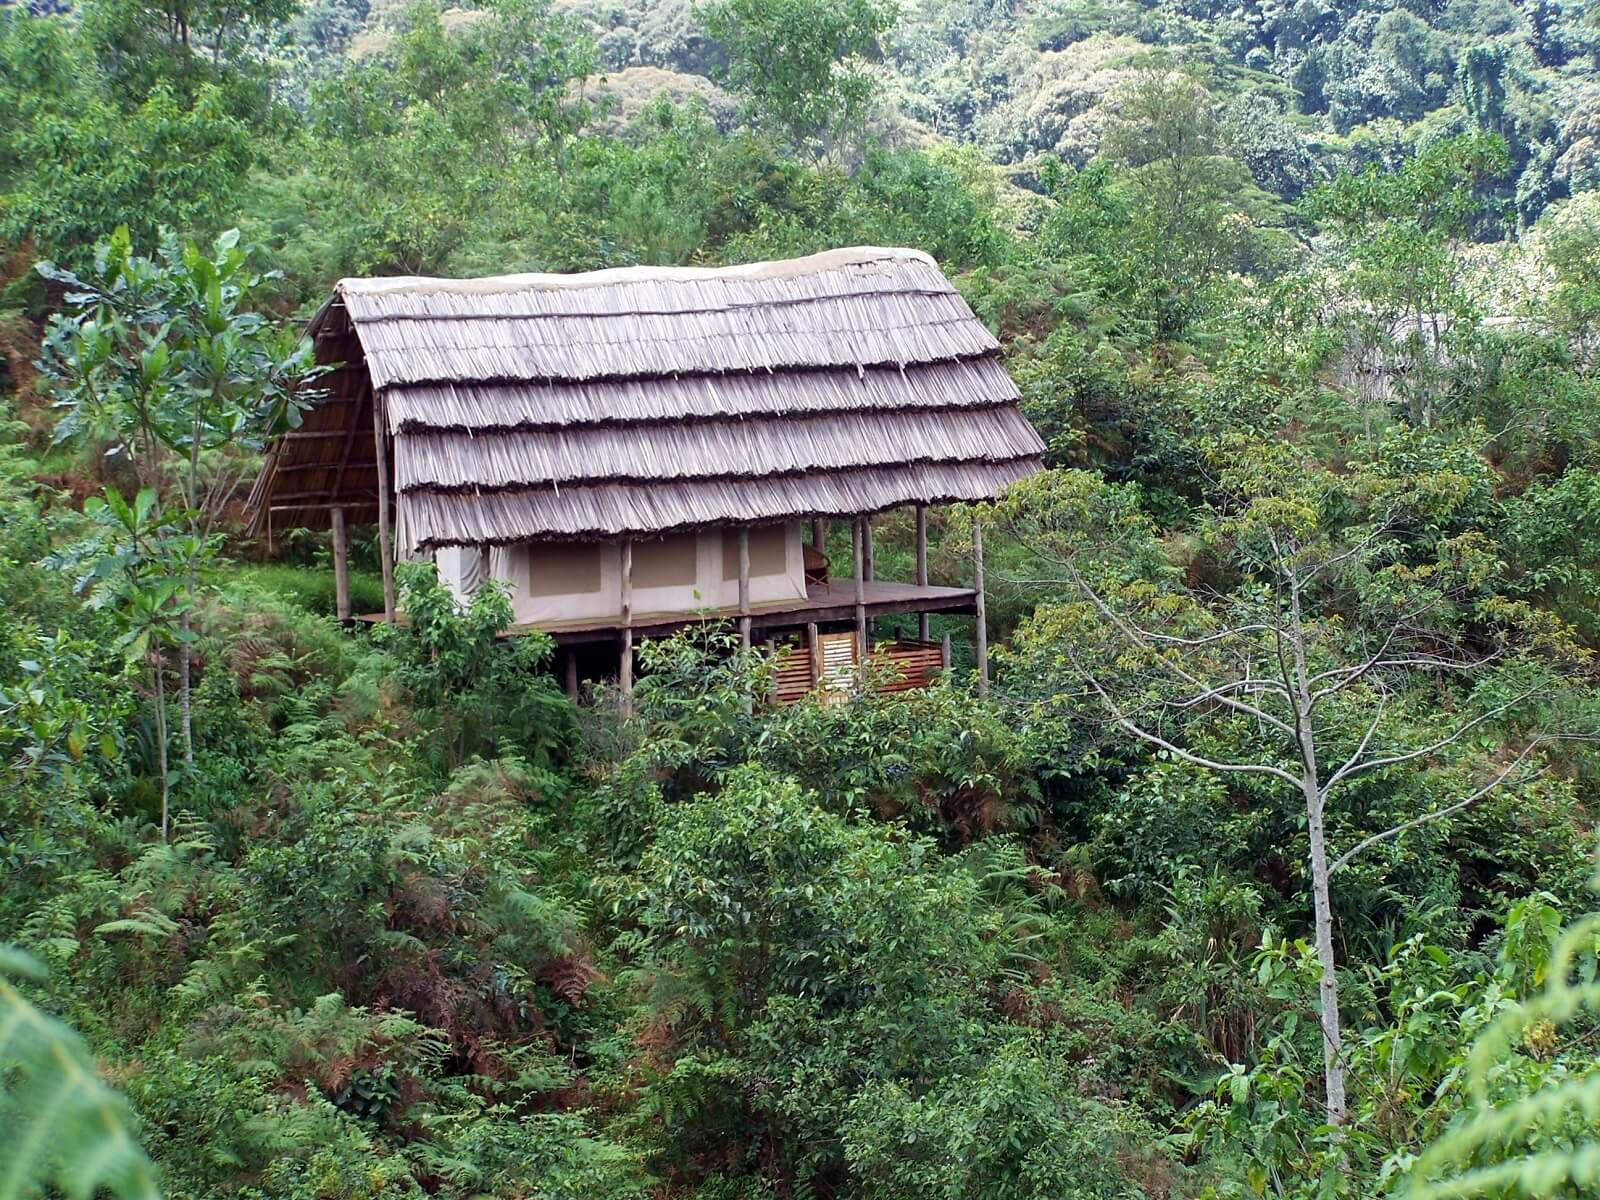 Cuckooland Lodge